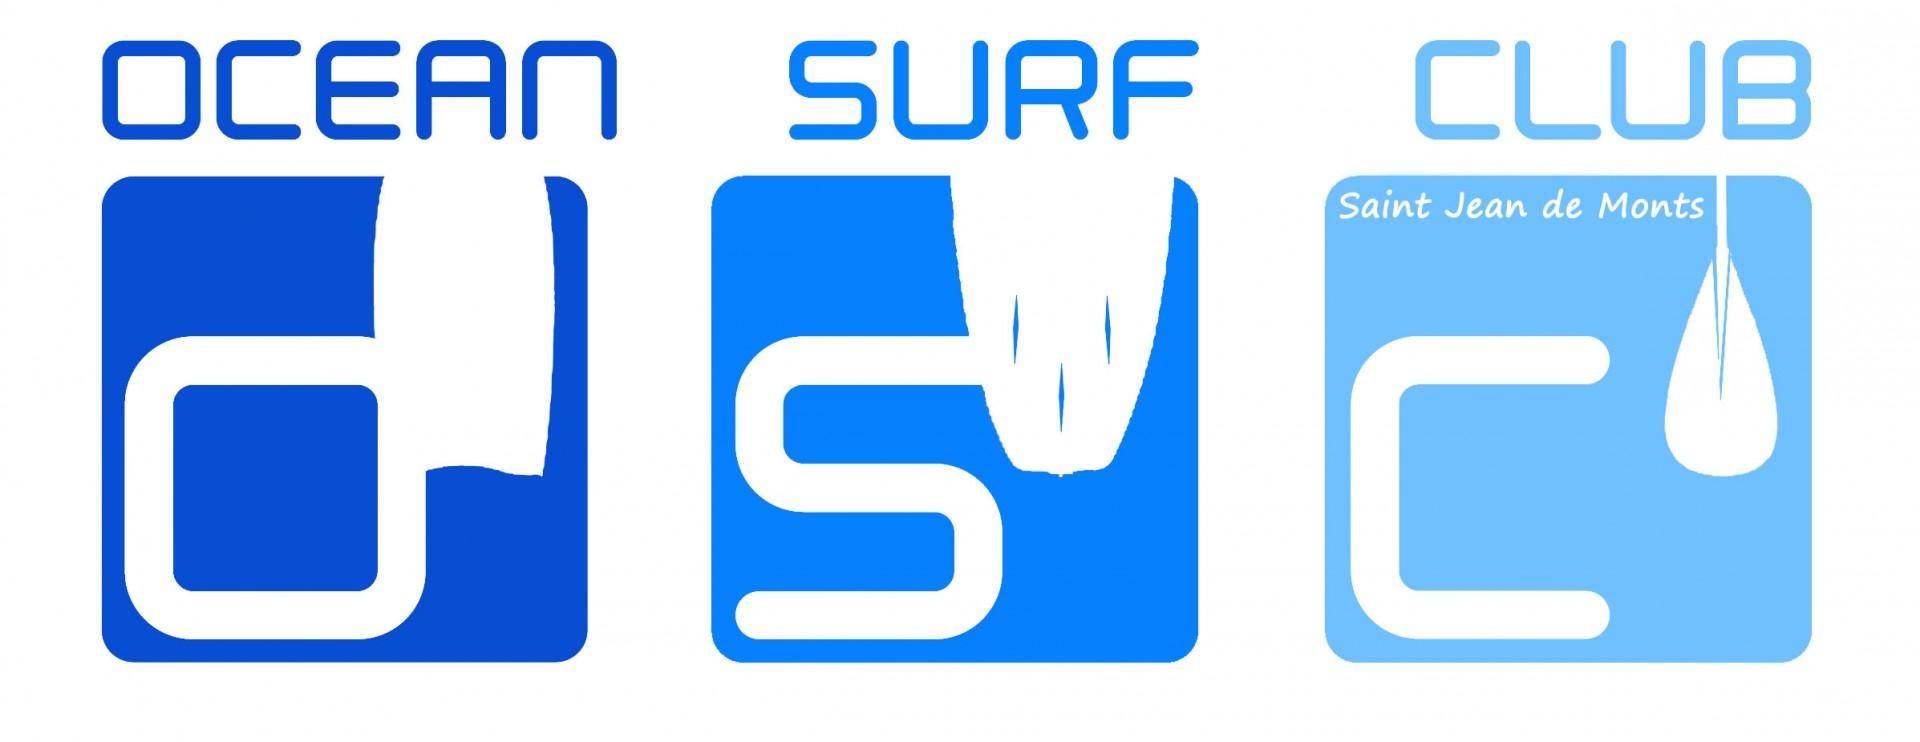 logo-ocean-surf-club-176565